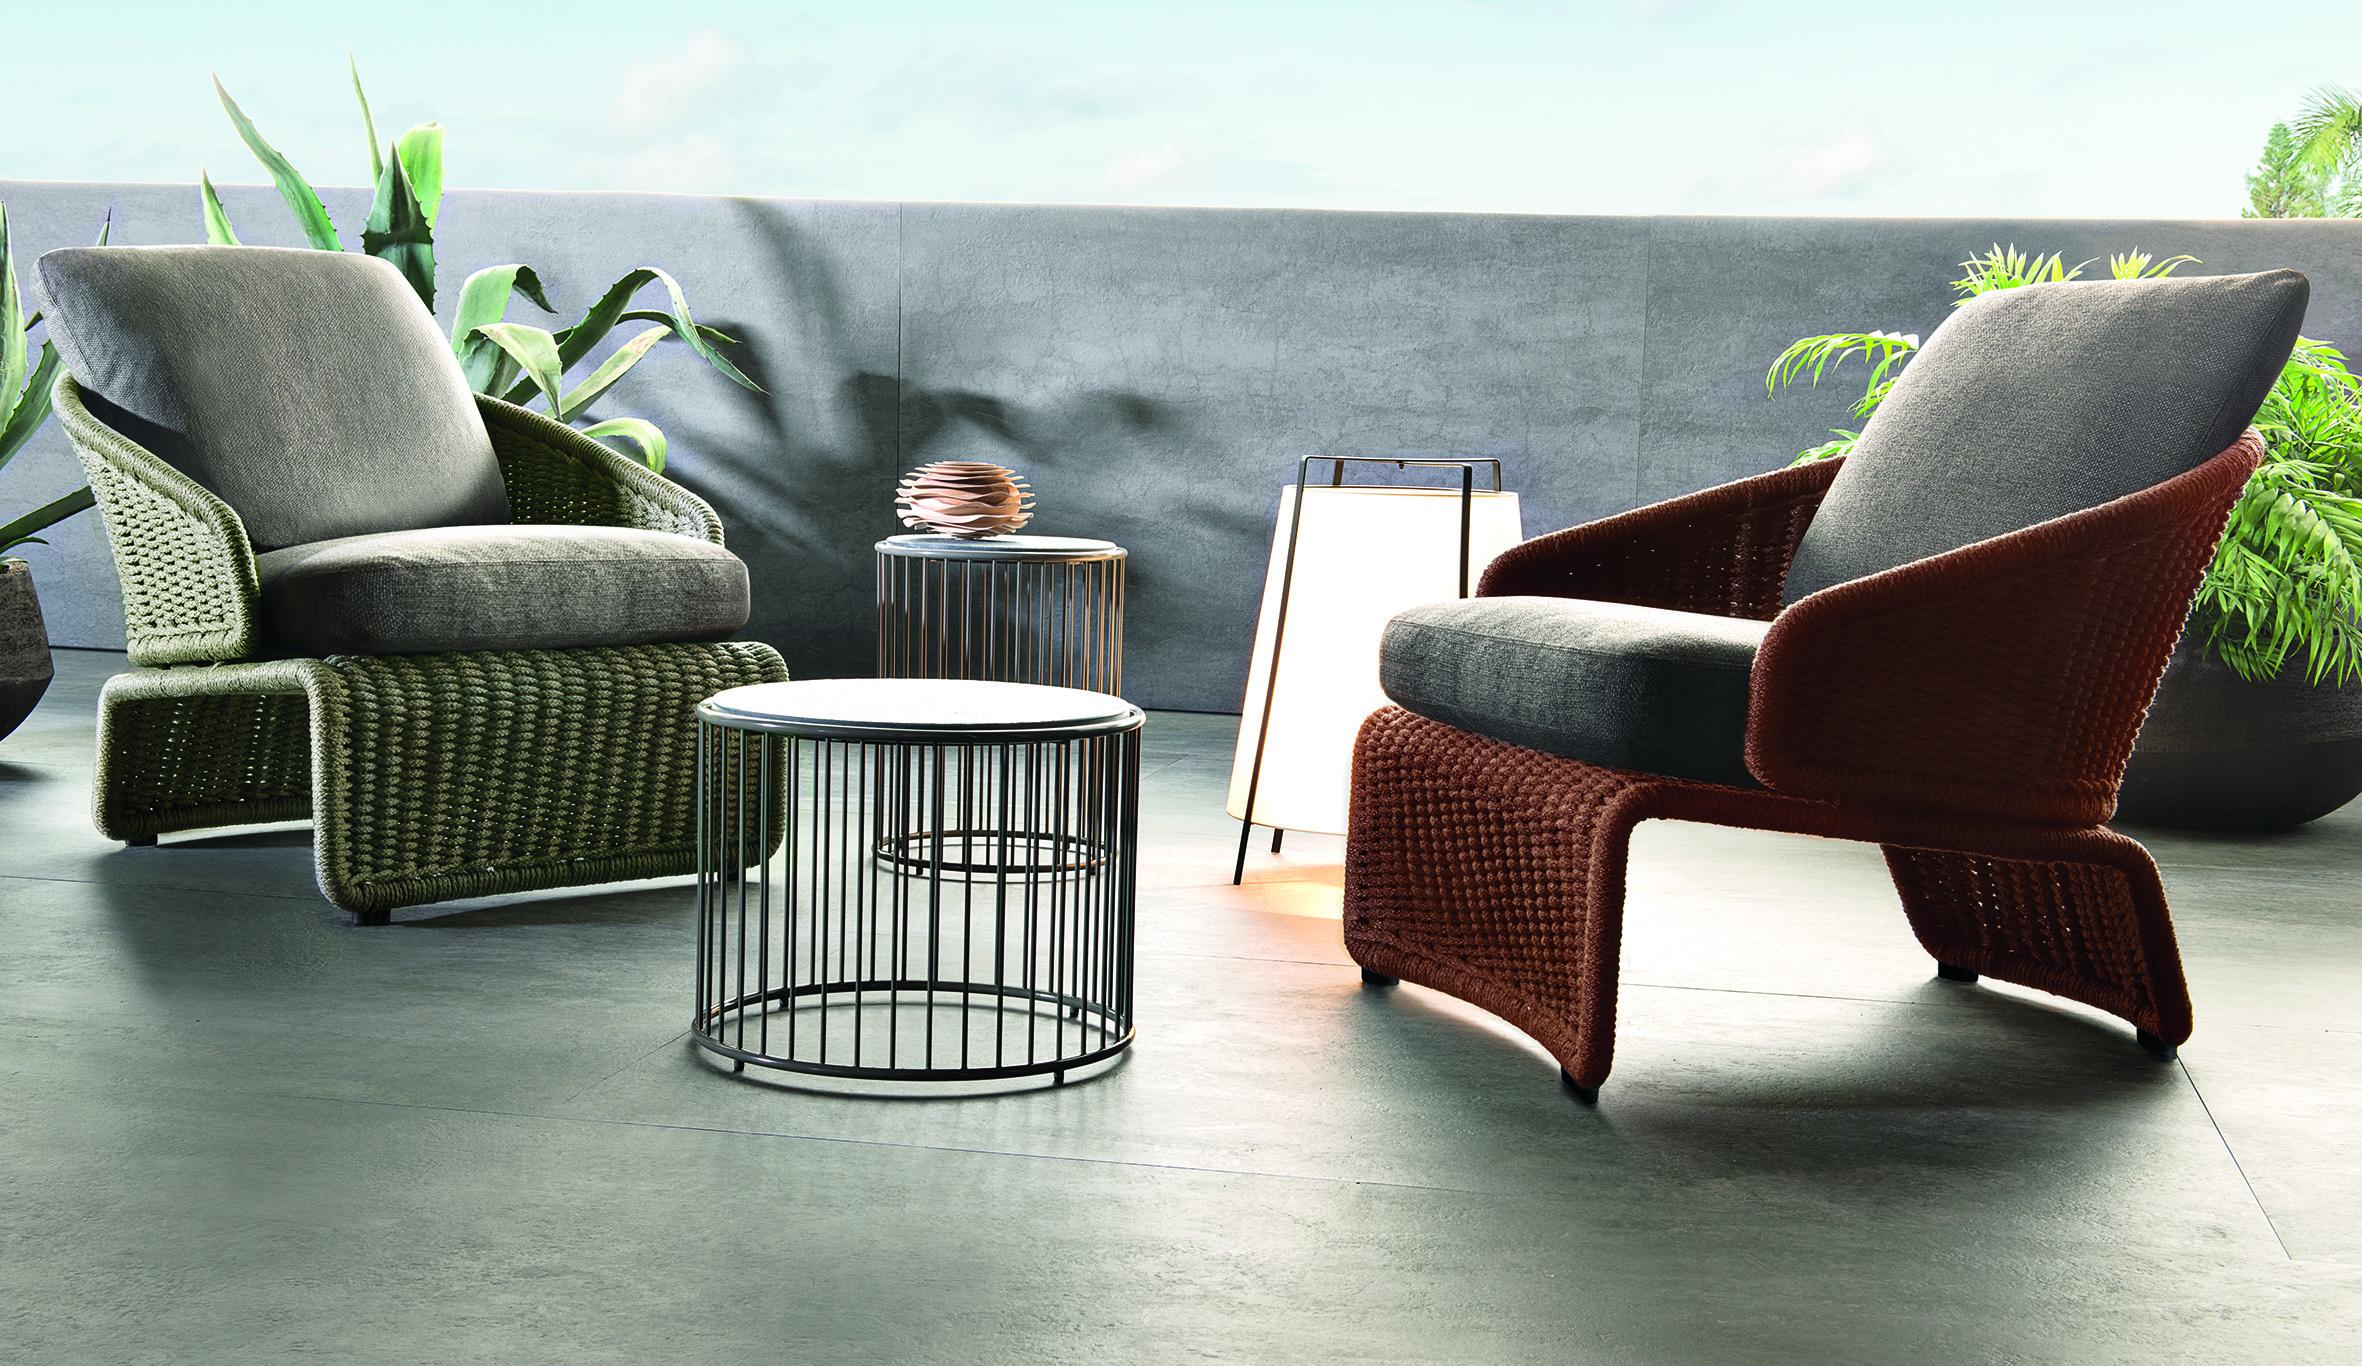 halley sessel outdoor von minotti stylepark. Black Bedroom Furniture Sets. Home Design Ideas